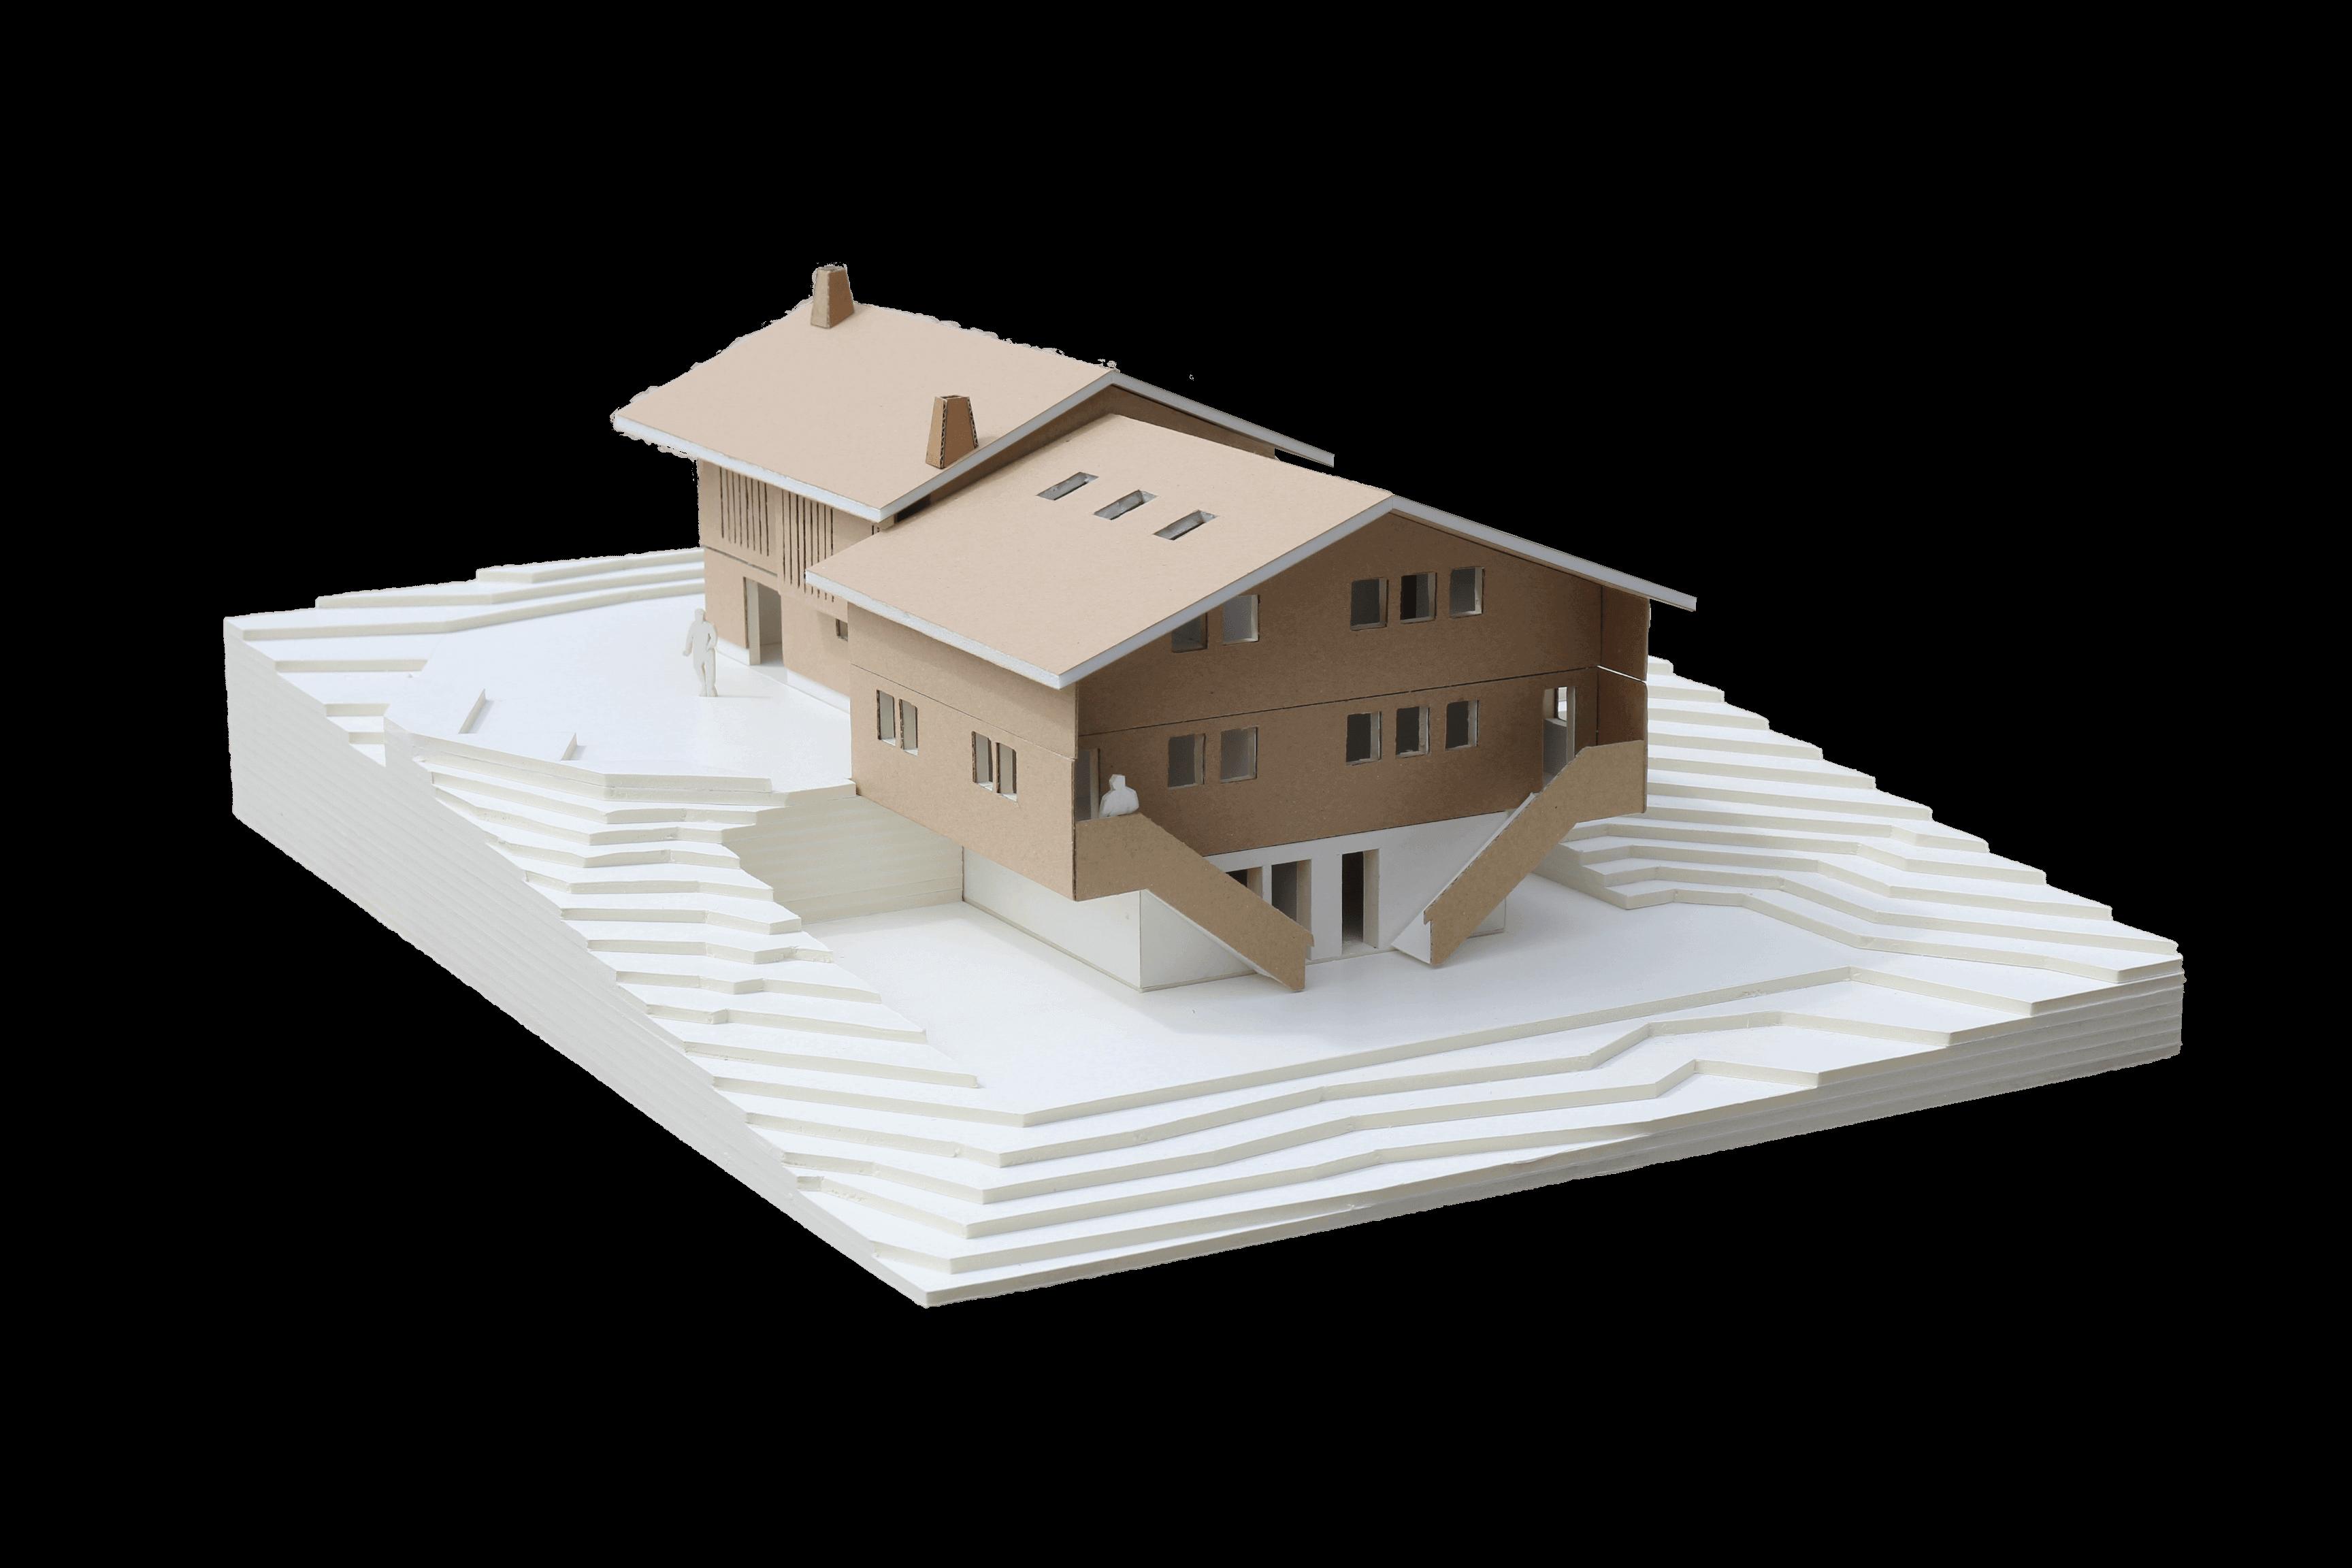 https://fsw-kreatektur.ch/wp-content/uploads/Fsw-Kreatektur-Architektur-Modellbau-Chalet.png